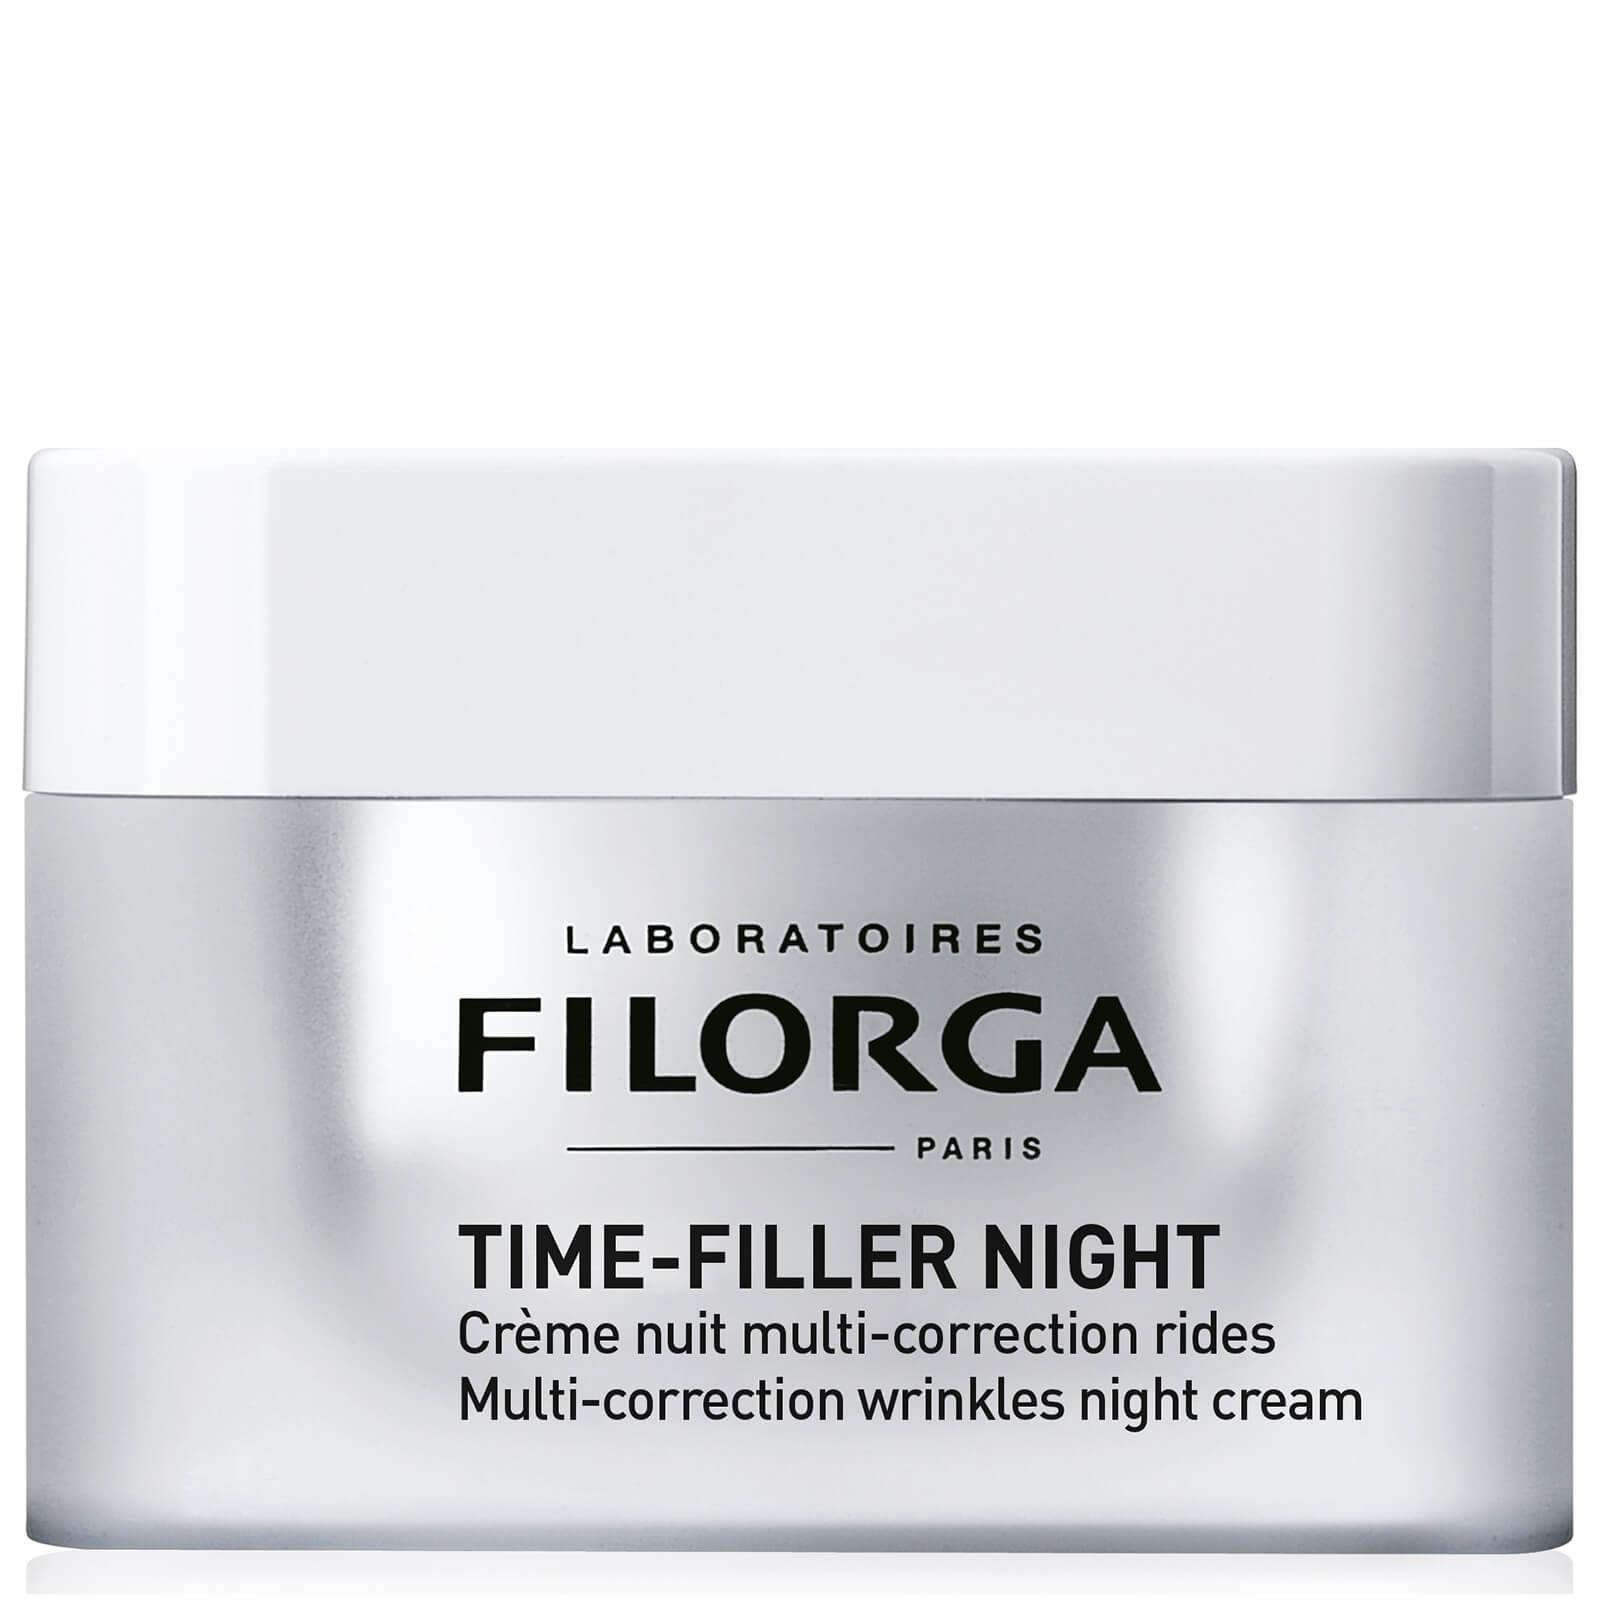 Filorga Time Filler Night Treatment 50ml